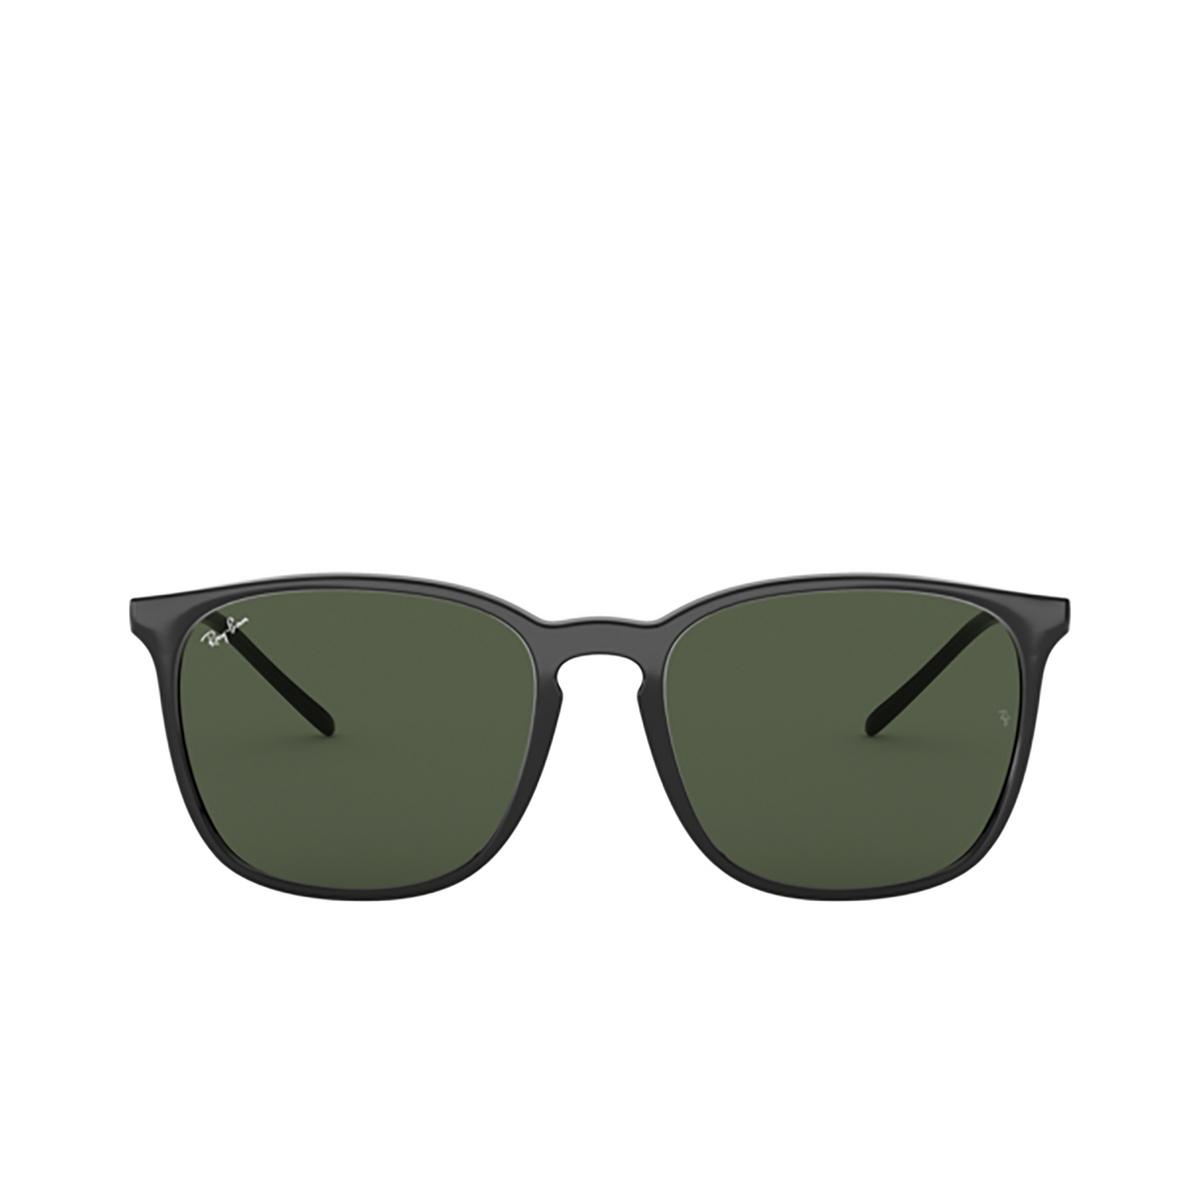 Ray-Ban® Square Sunglasses: RB4387 color Black 601/71 - 1/3.